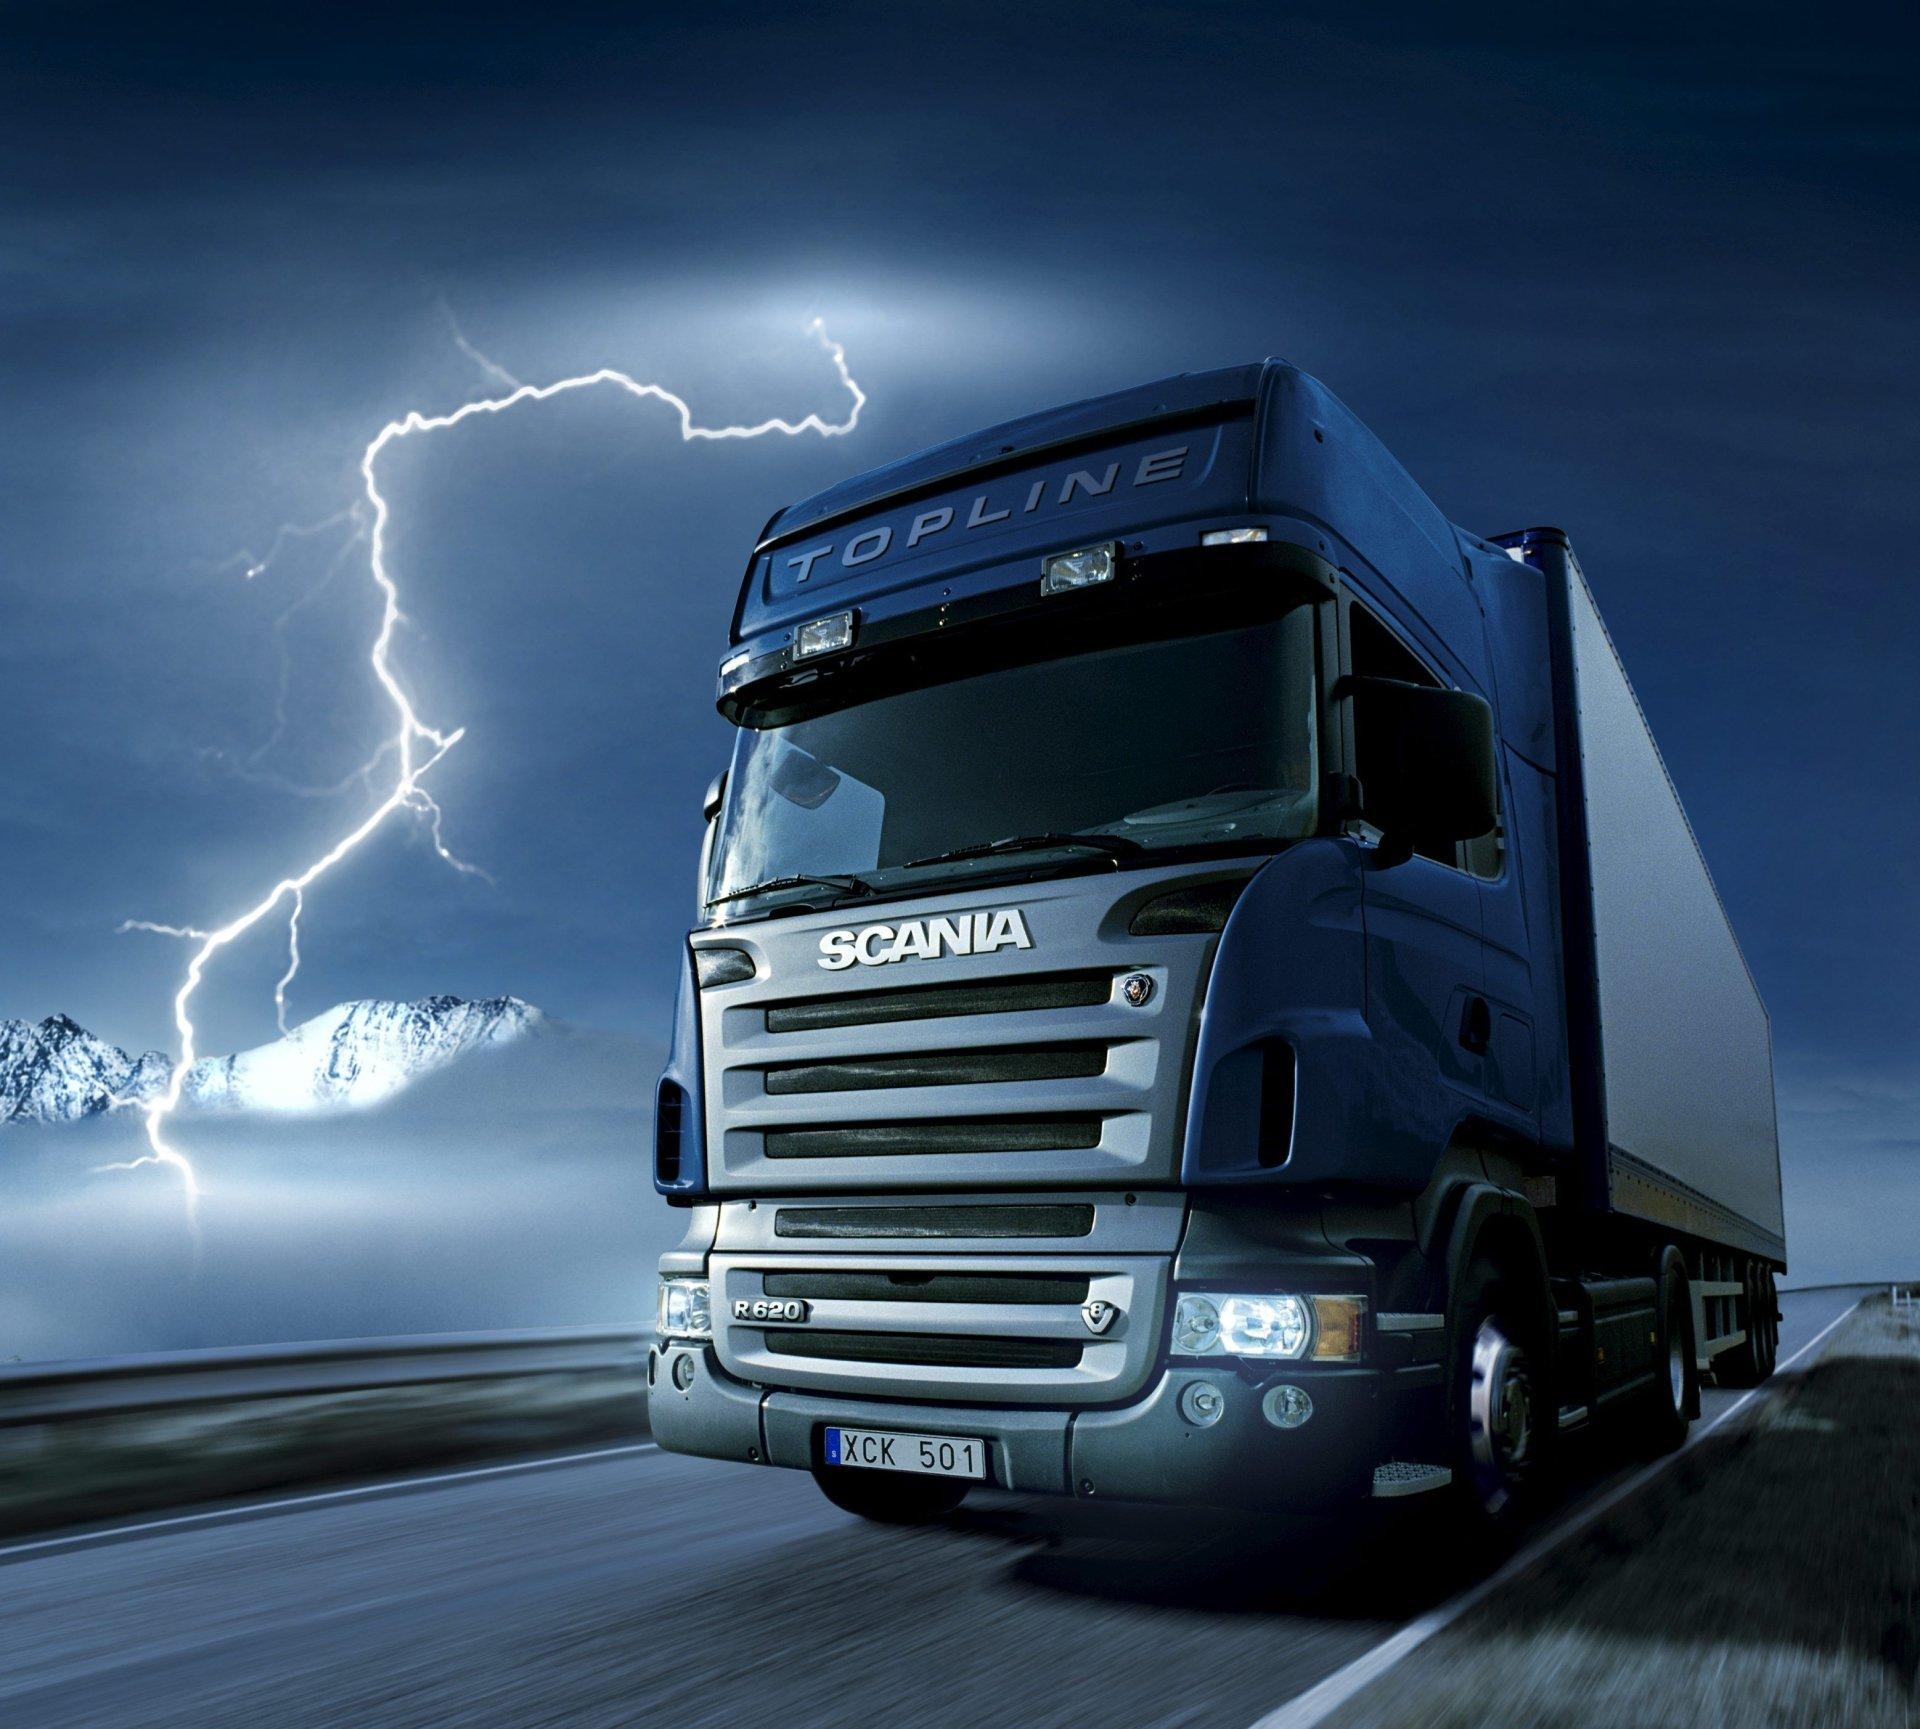 Euro Truck Simulator 2 Papel De Parede Hd Plano De Fundo